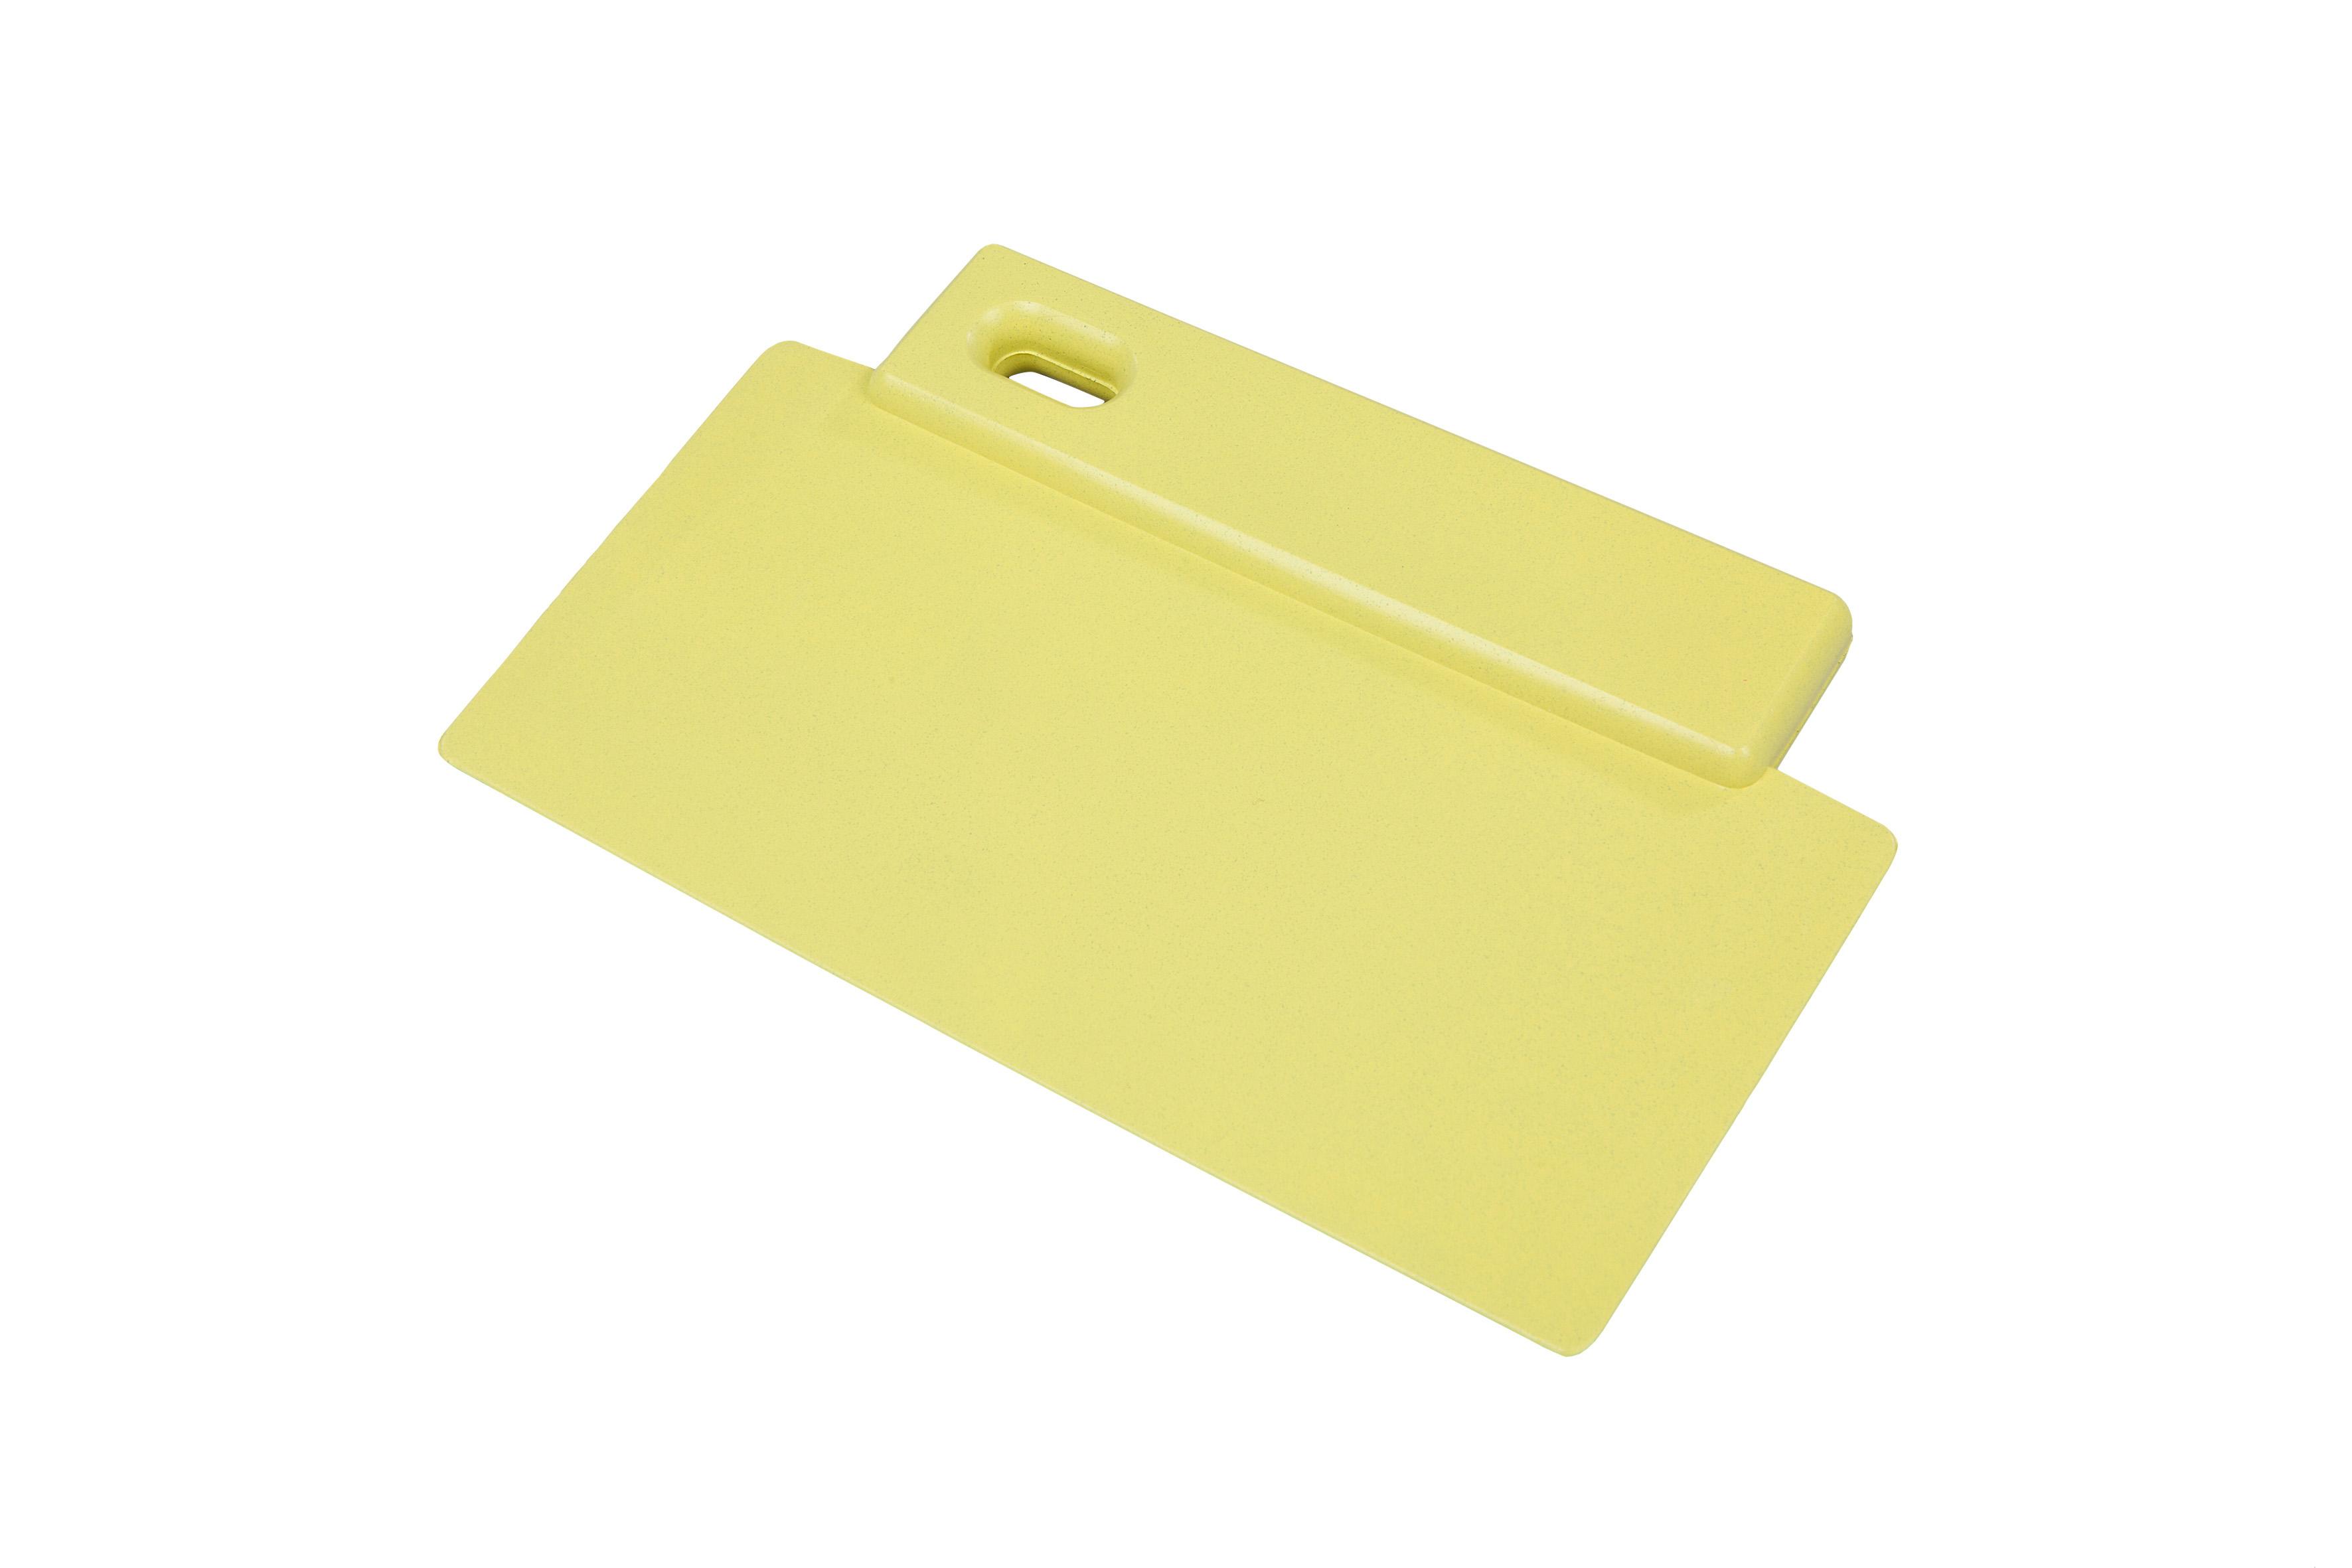 Unimop spaatel Ergo 200 x 125 mm, kollane, kastis 12 tk MD